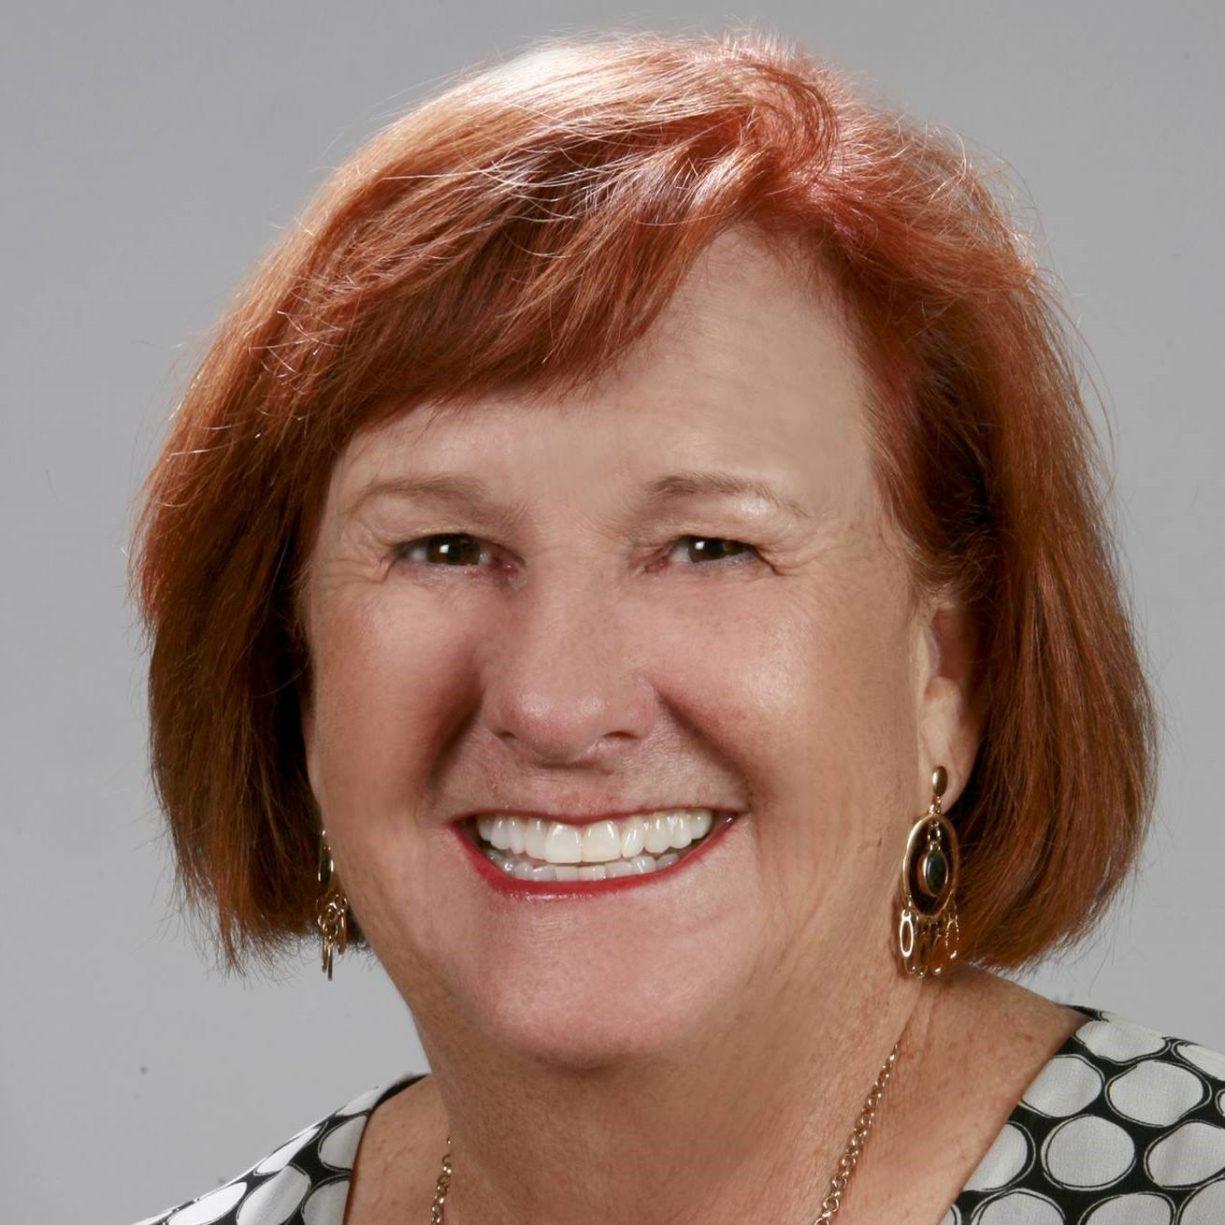 Vicki Campbell Smiling